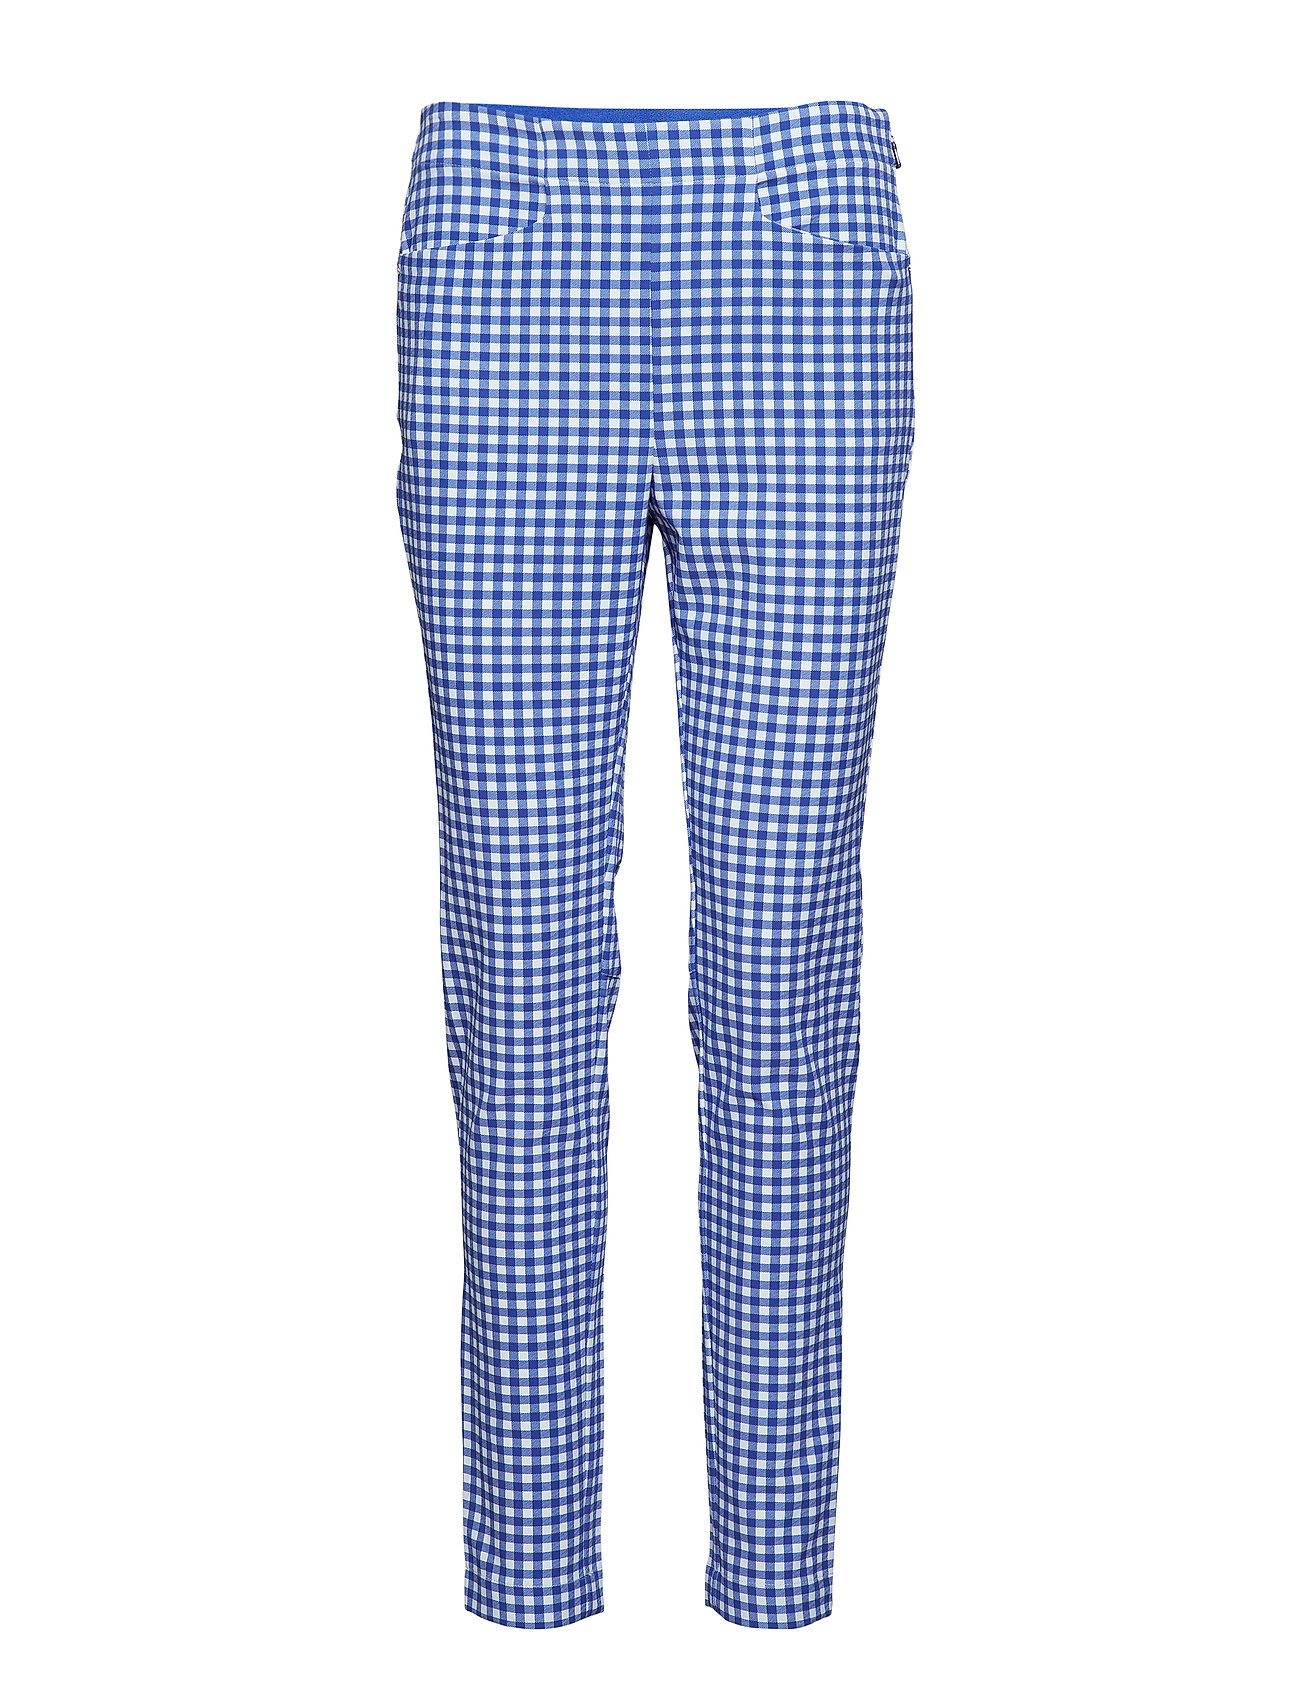 Ralph Lauren Golf Gingham Skinny Golf Pant - MAIDSTONE BLUE GI